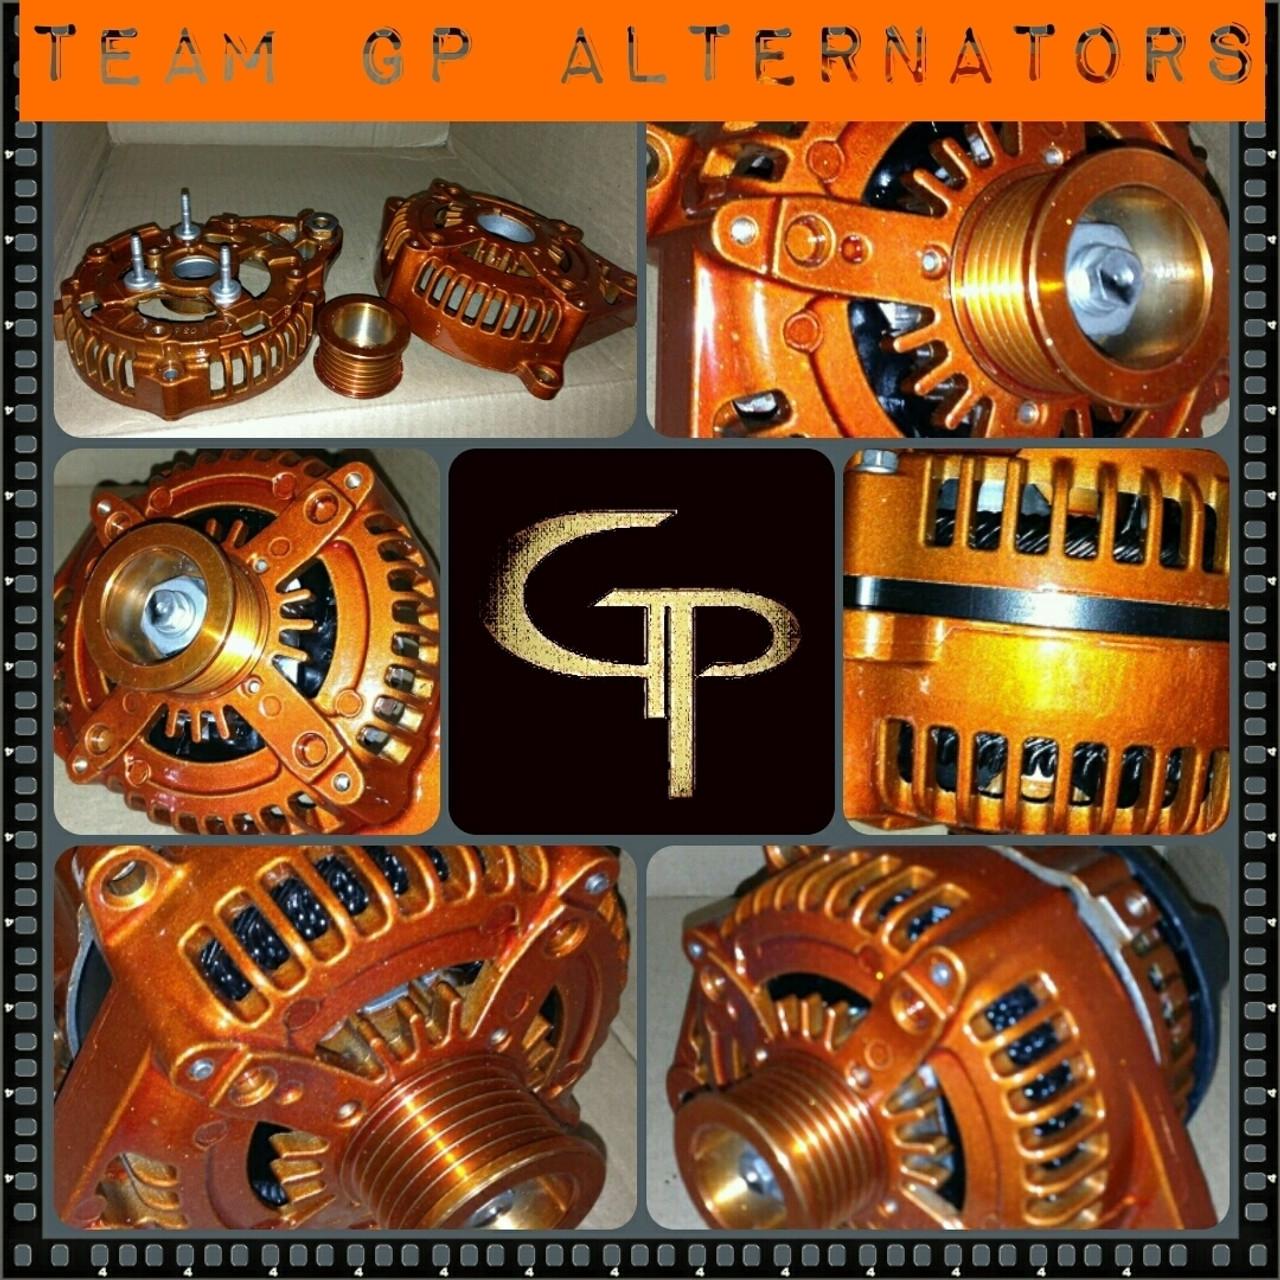 TOYOTA CAMRY 2.2 -1995-2001- 160AMP TEAM GP Alternator